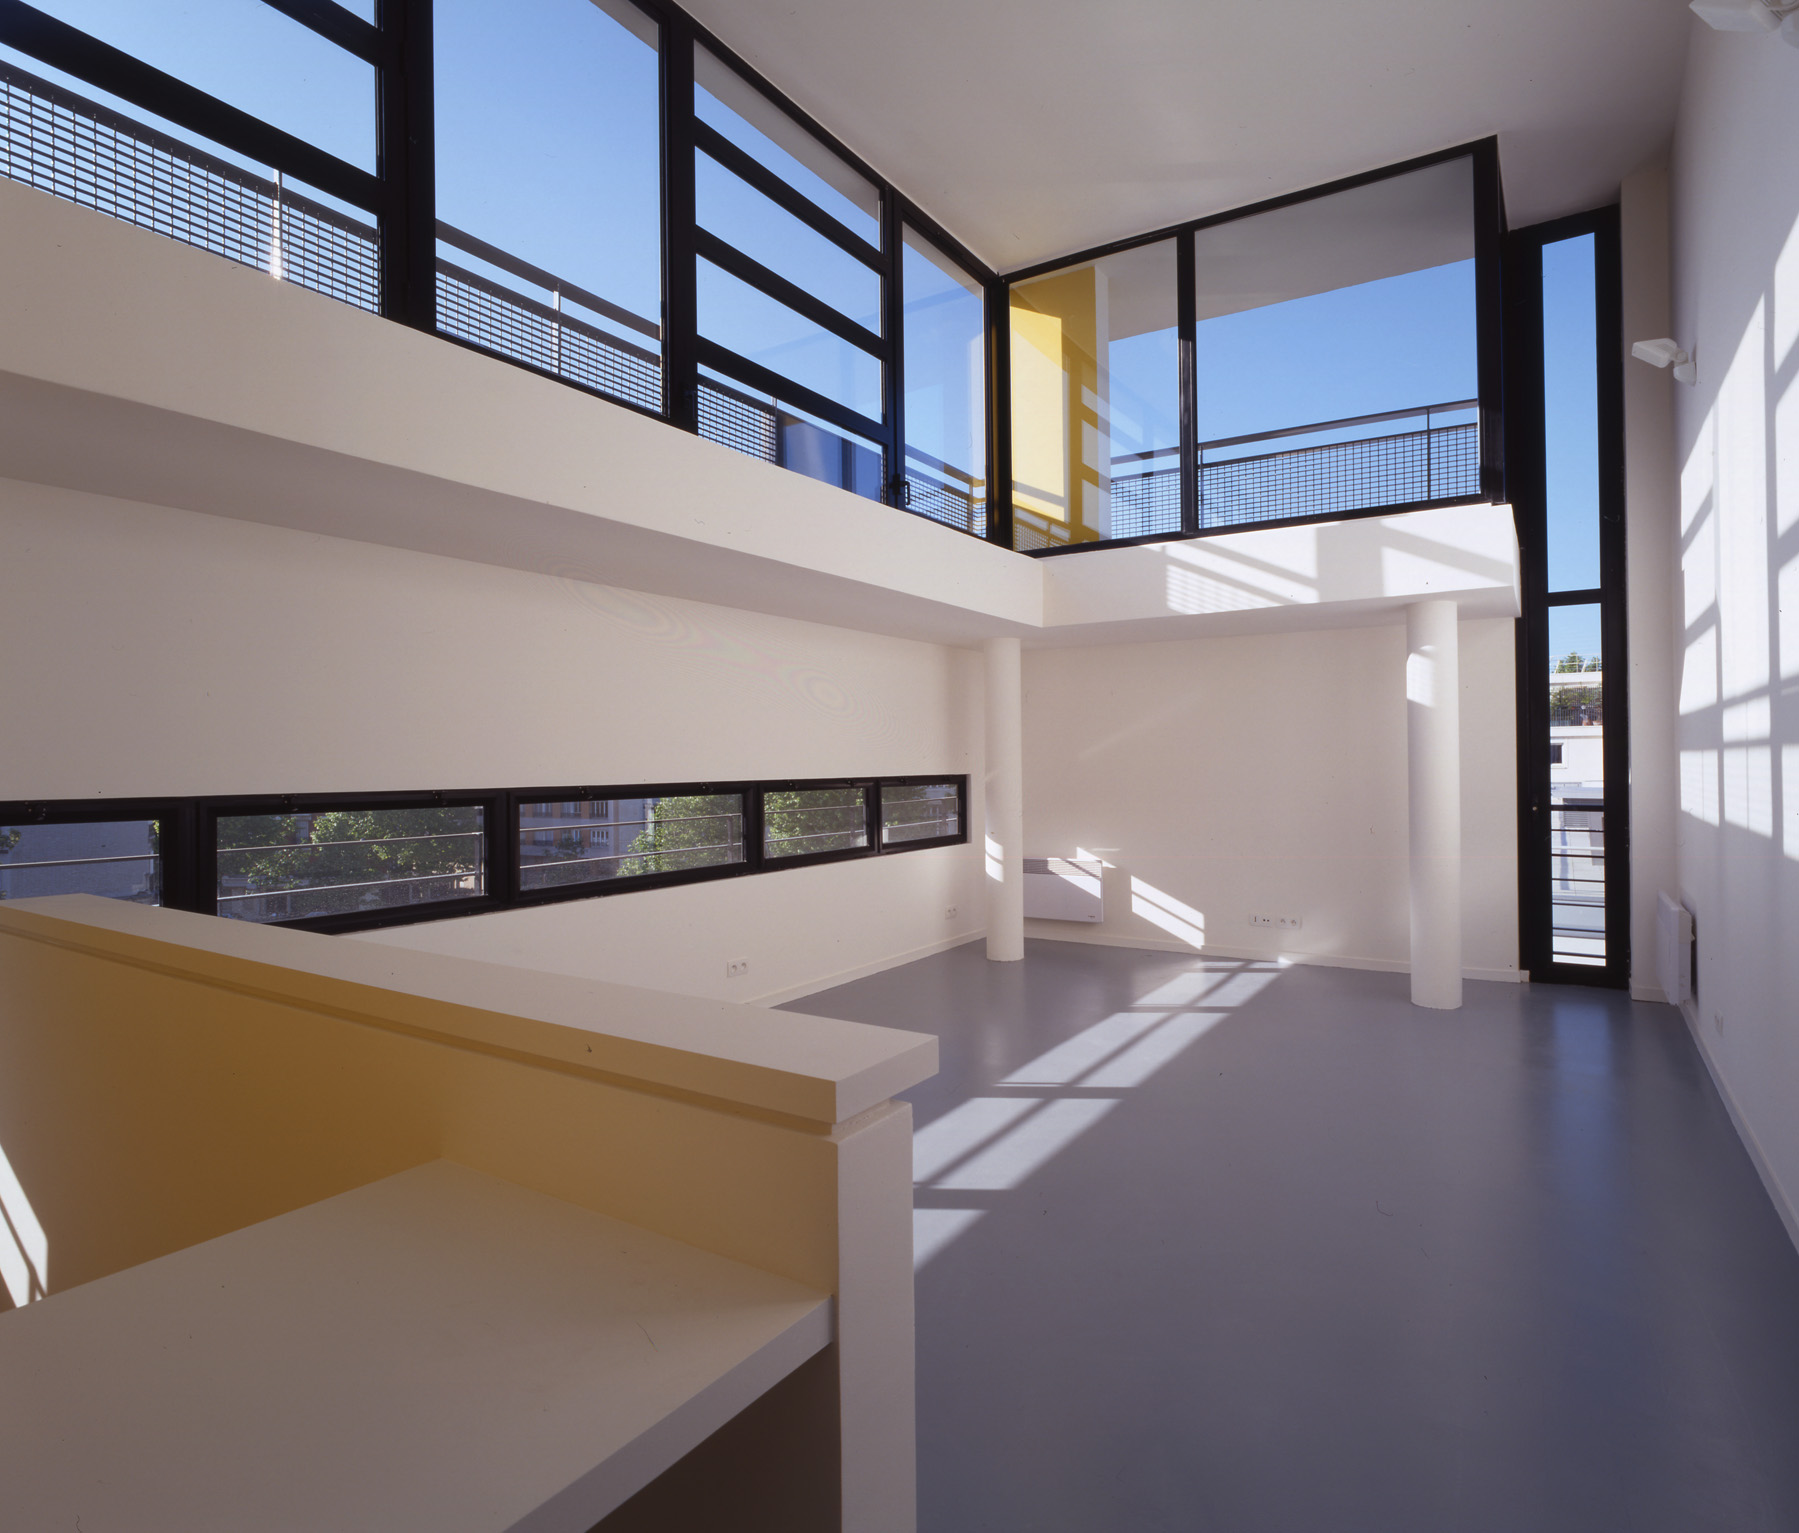 Ensa Paris Val De Seine artists' studios paris - france - urbanplanet info